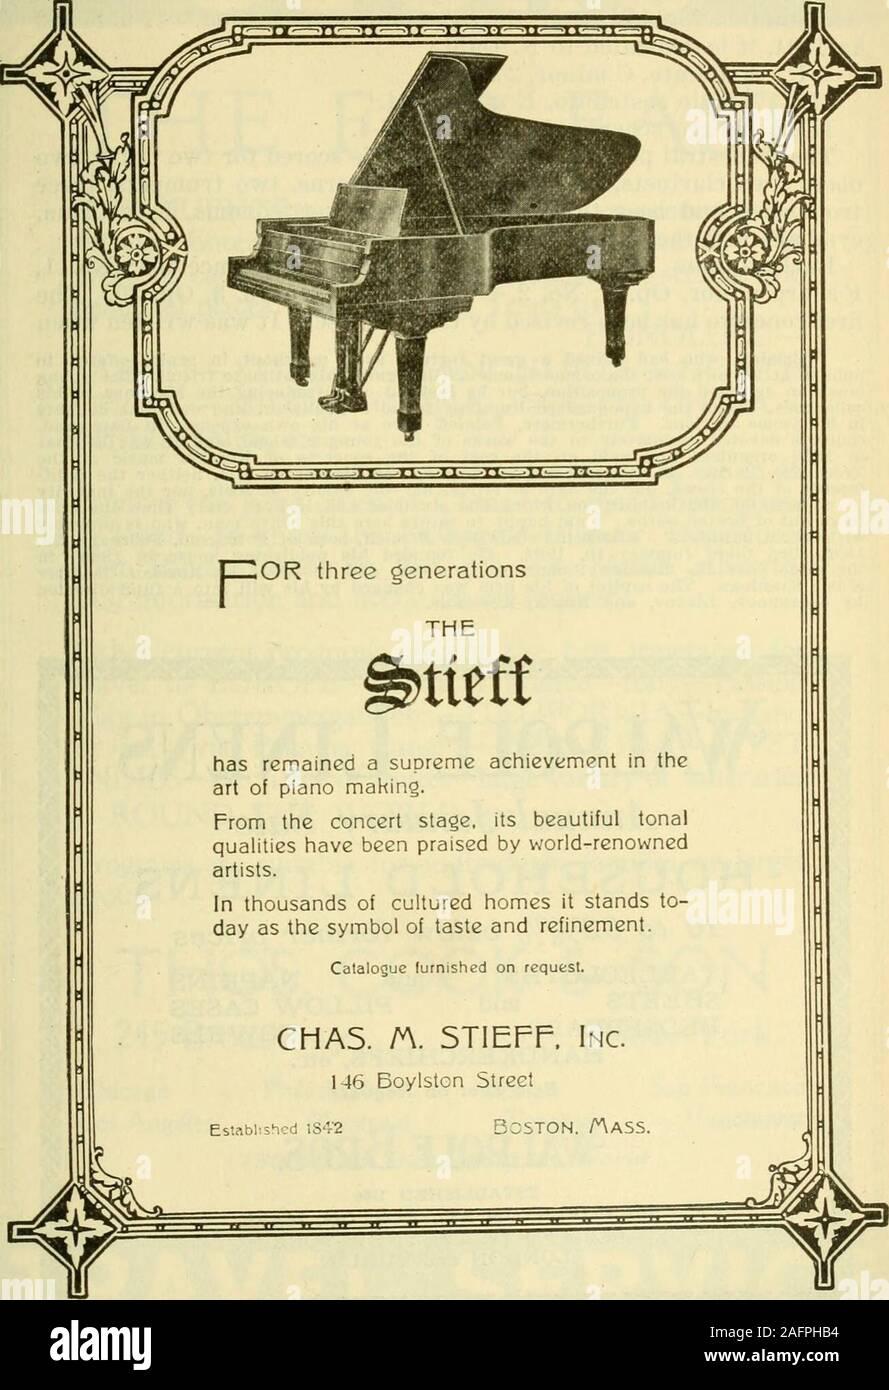 Piano Avec Four Gaz oif ii stock photos & oif ii stock images - alamy